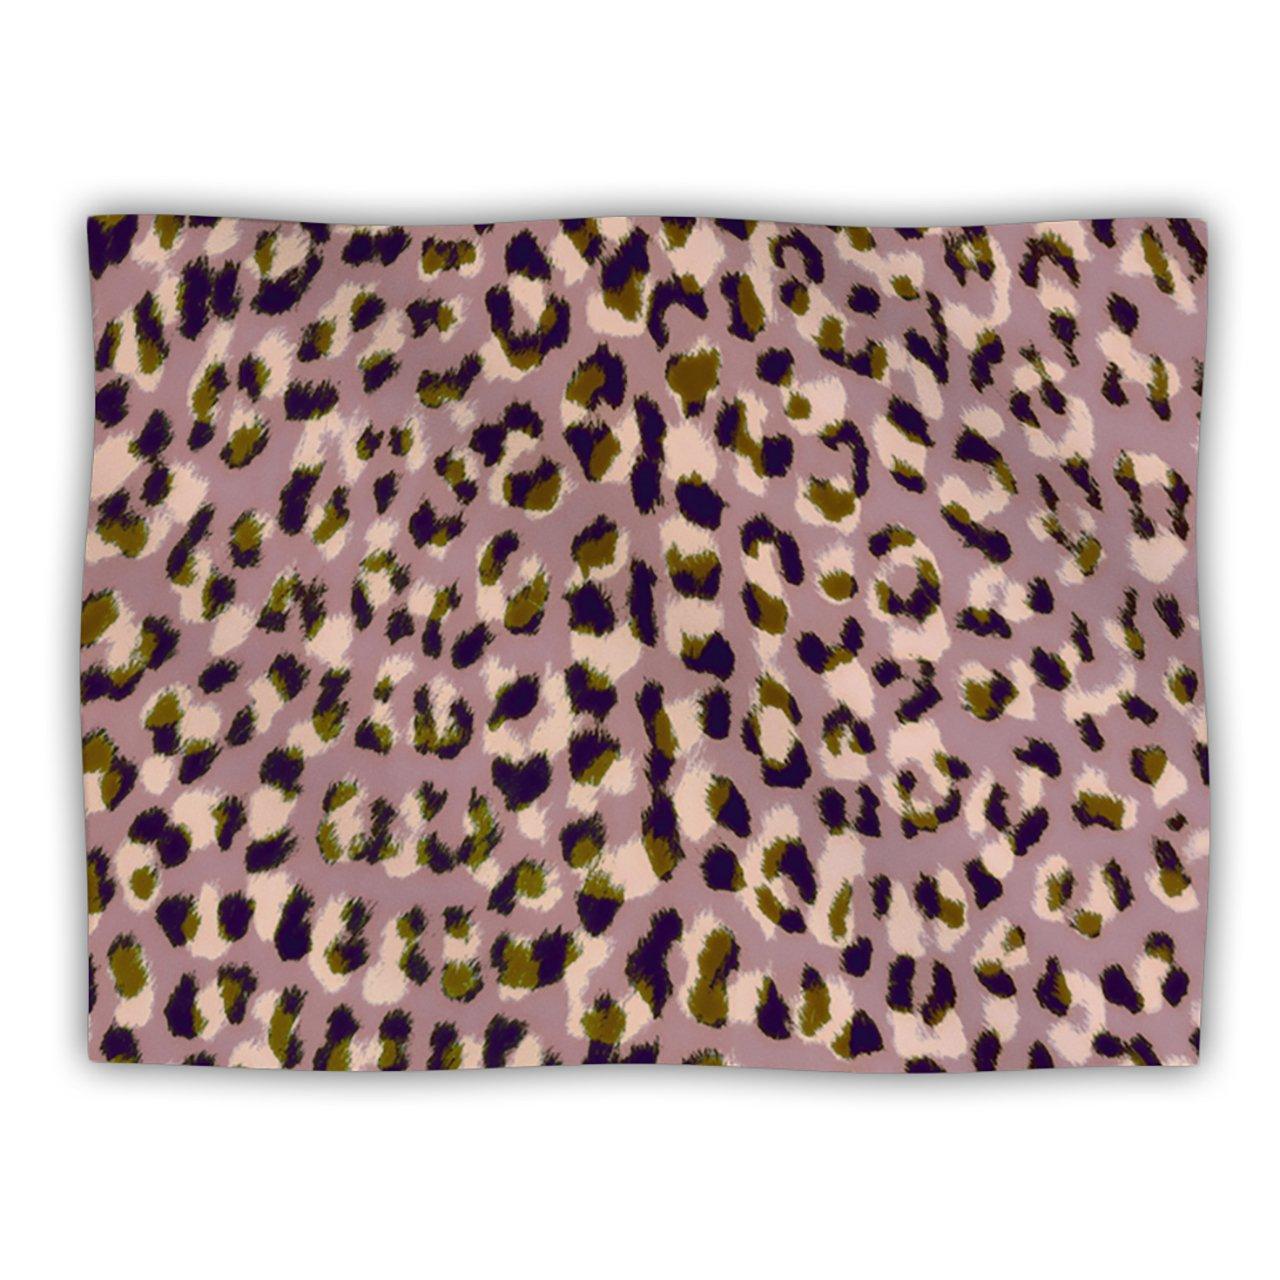 Kess InHouse Vasare Nar ''Leo Cheetah'' Animal Pattern Pet Dog Blanket, 40 by 30-Inch